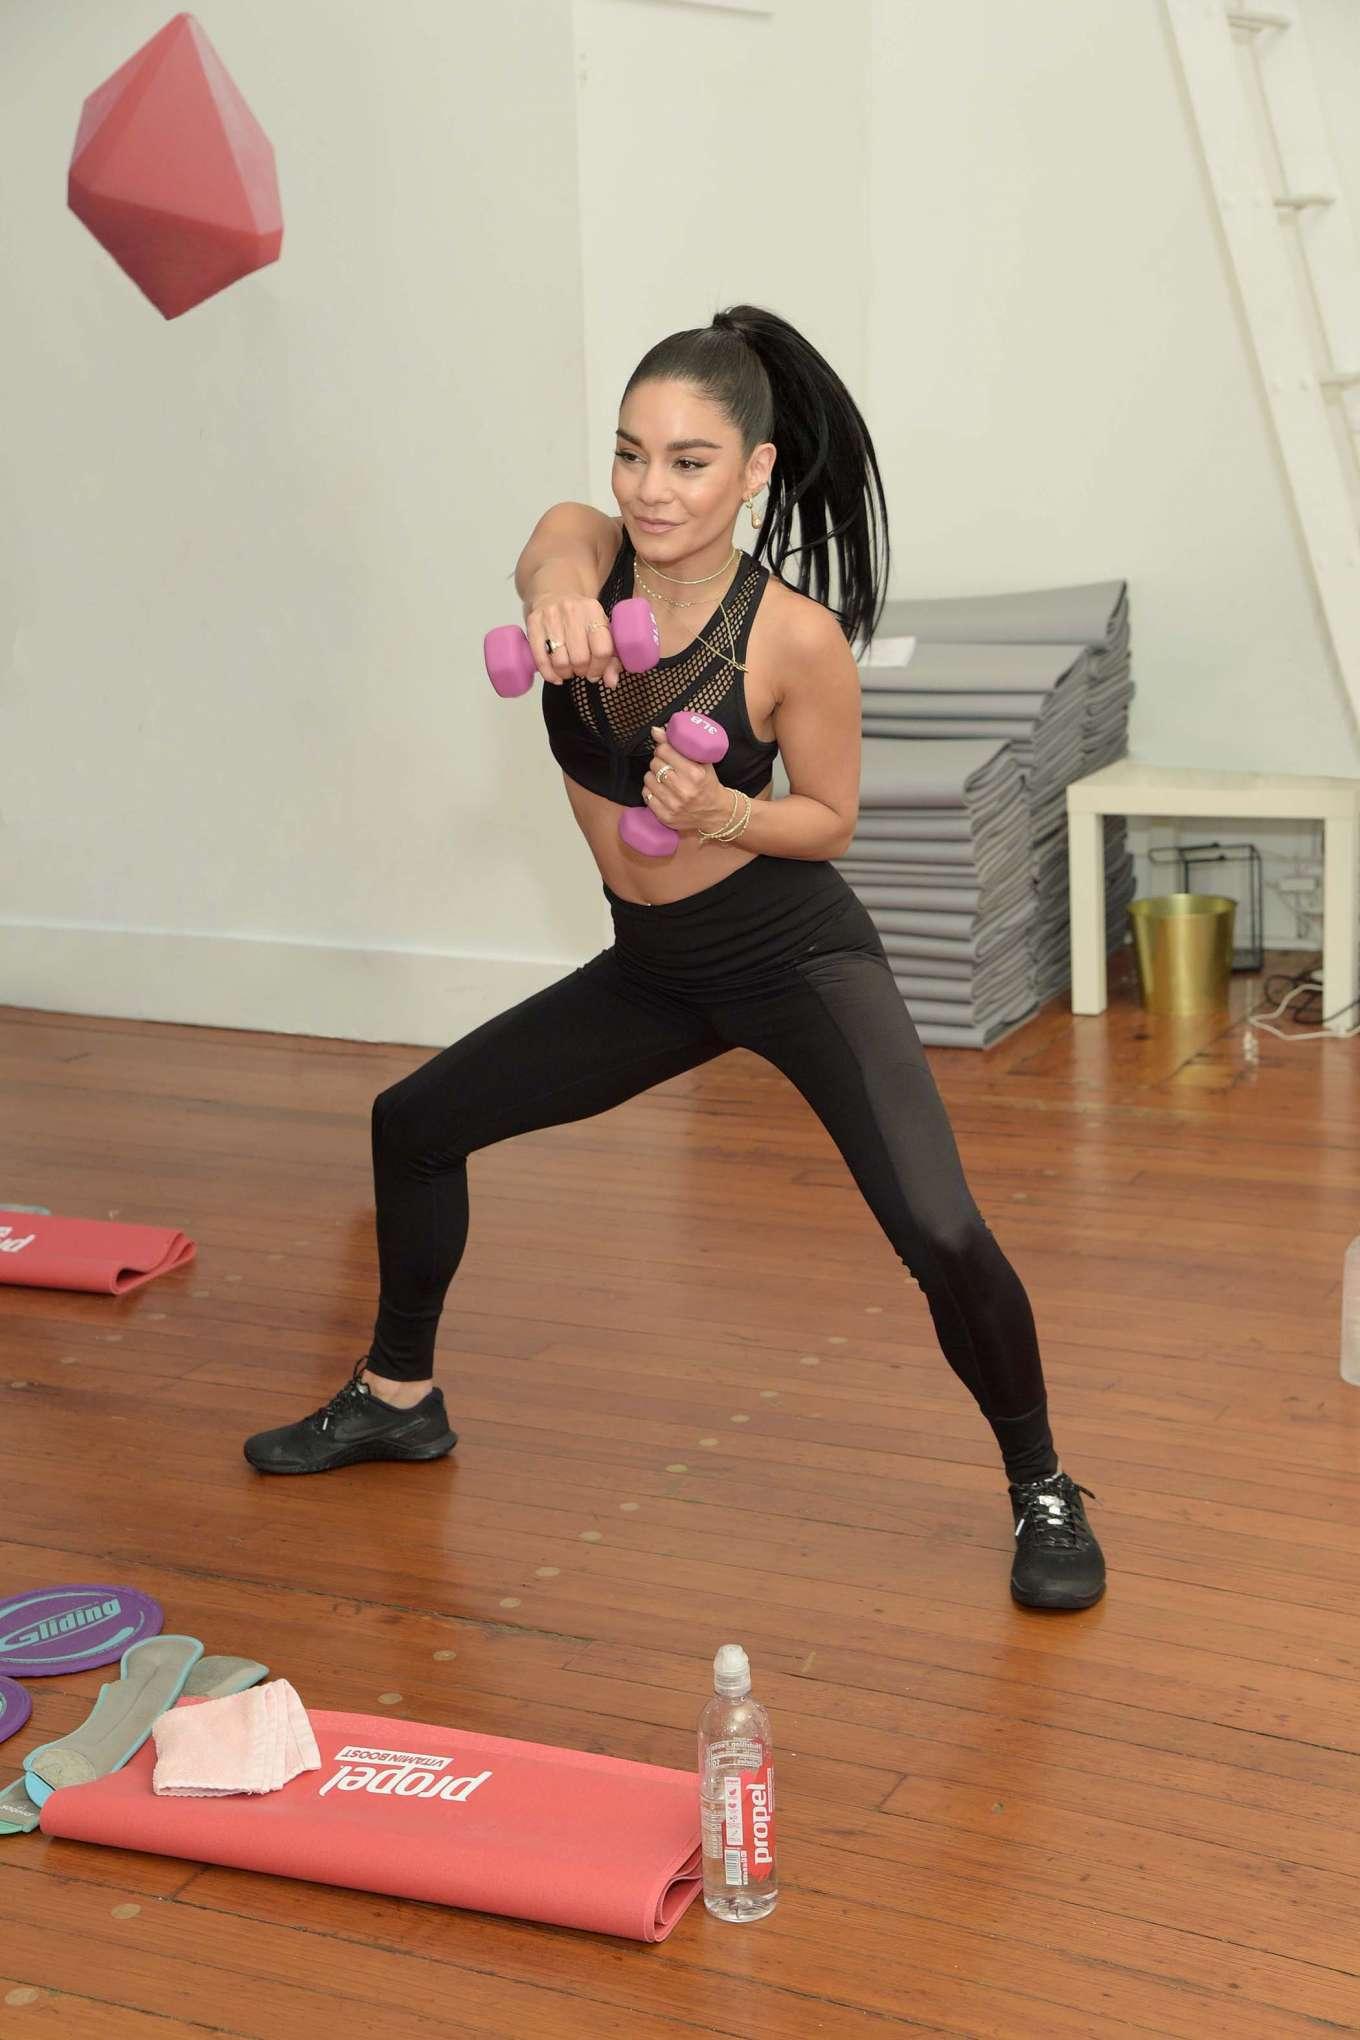 Vanessa Hudgens 2019 : Vanessa Hudgens: Works out with Propel Vitamin Boost -15